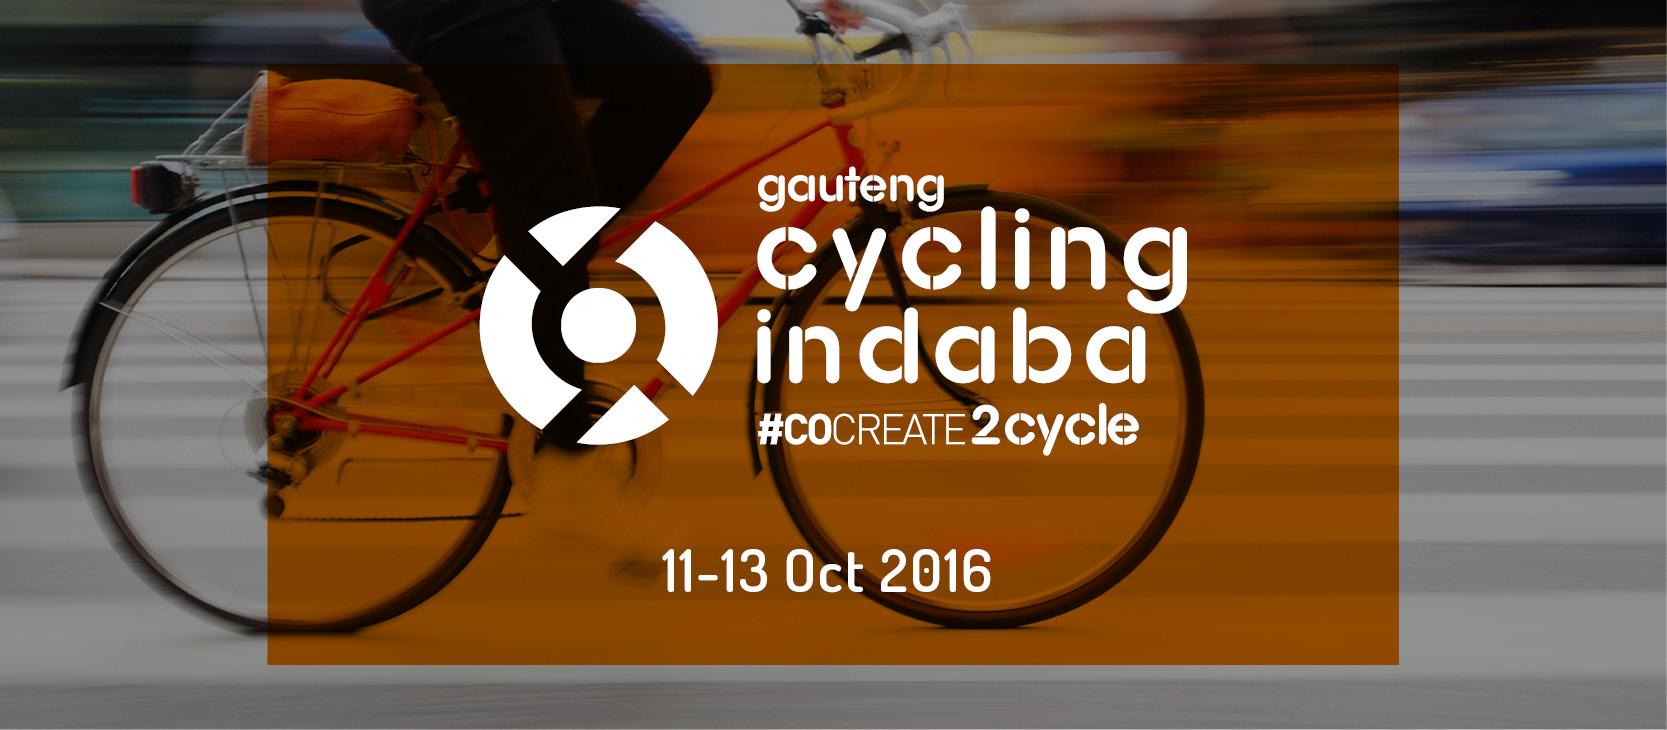 jhb-gauteng-cycling-indaba_conference